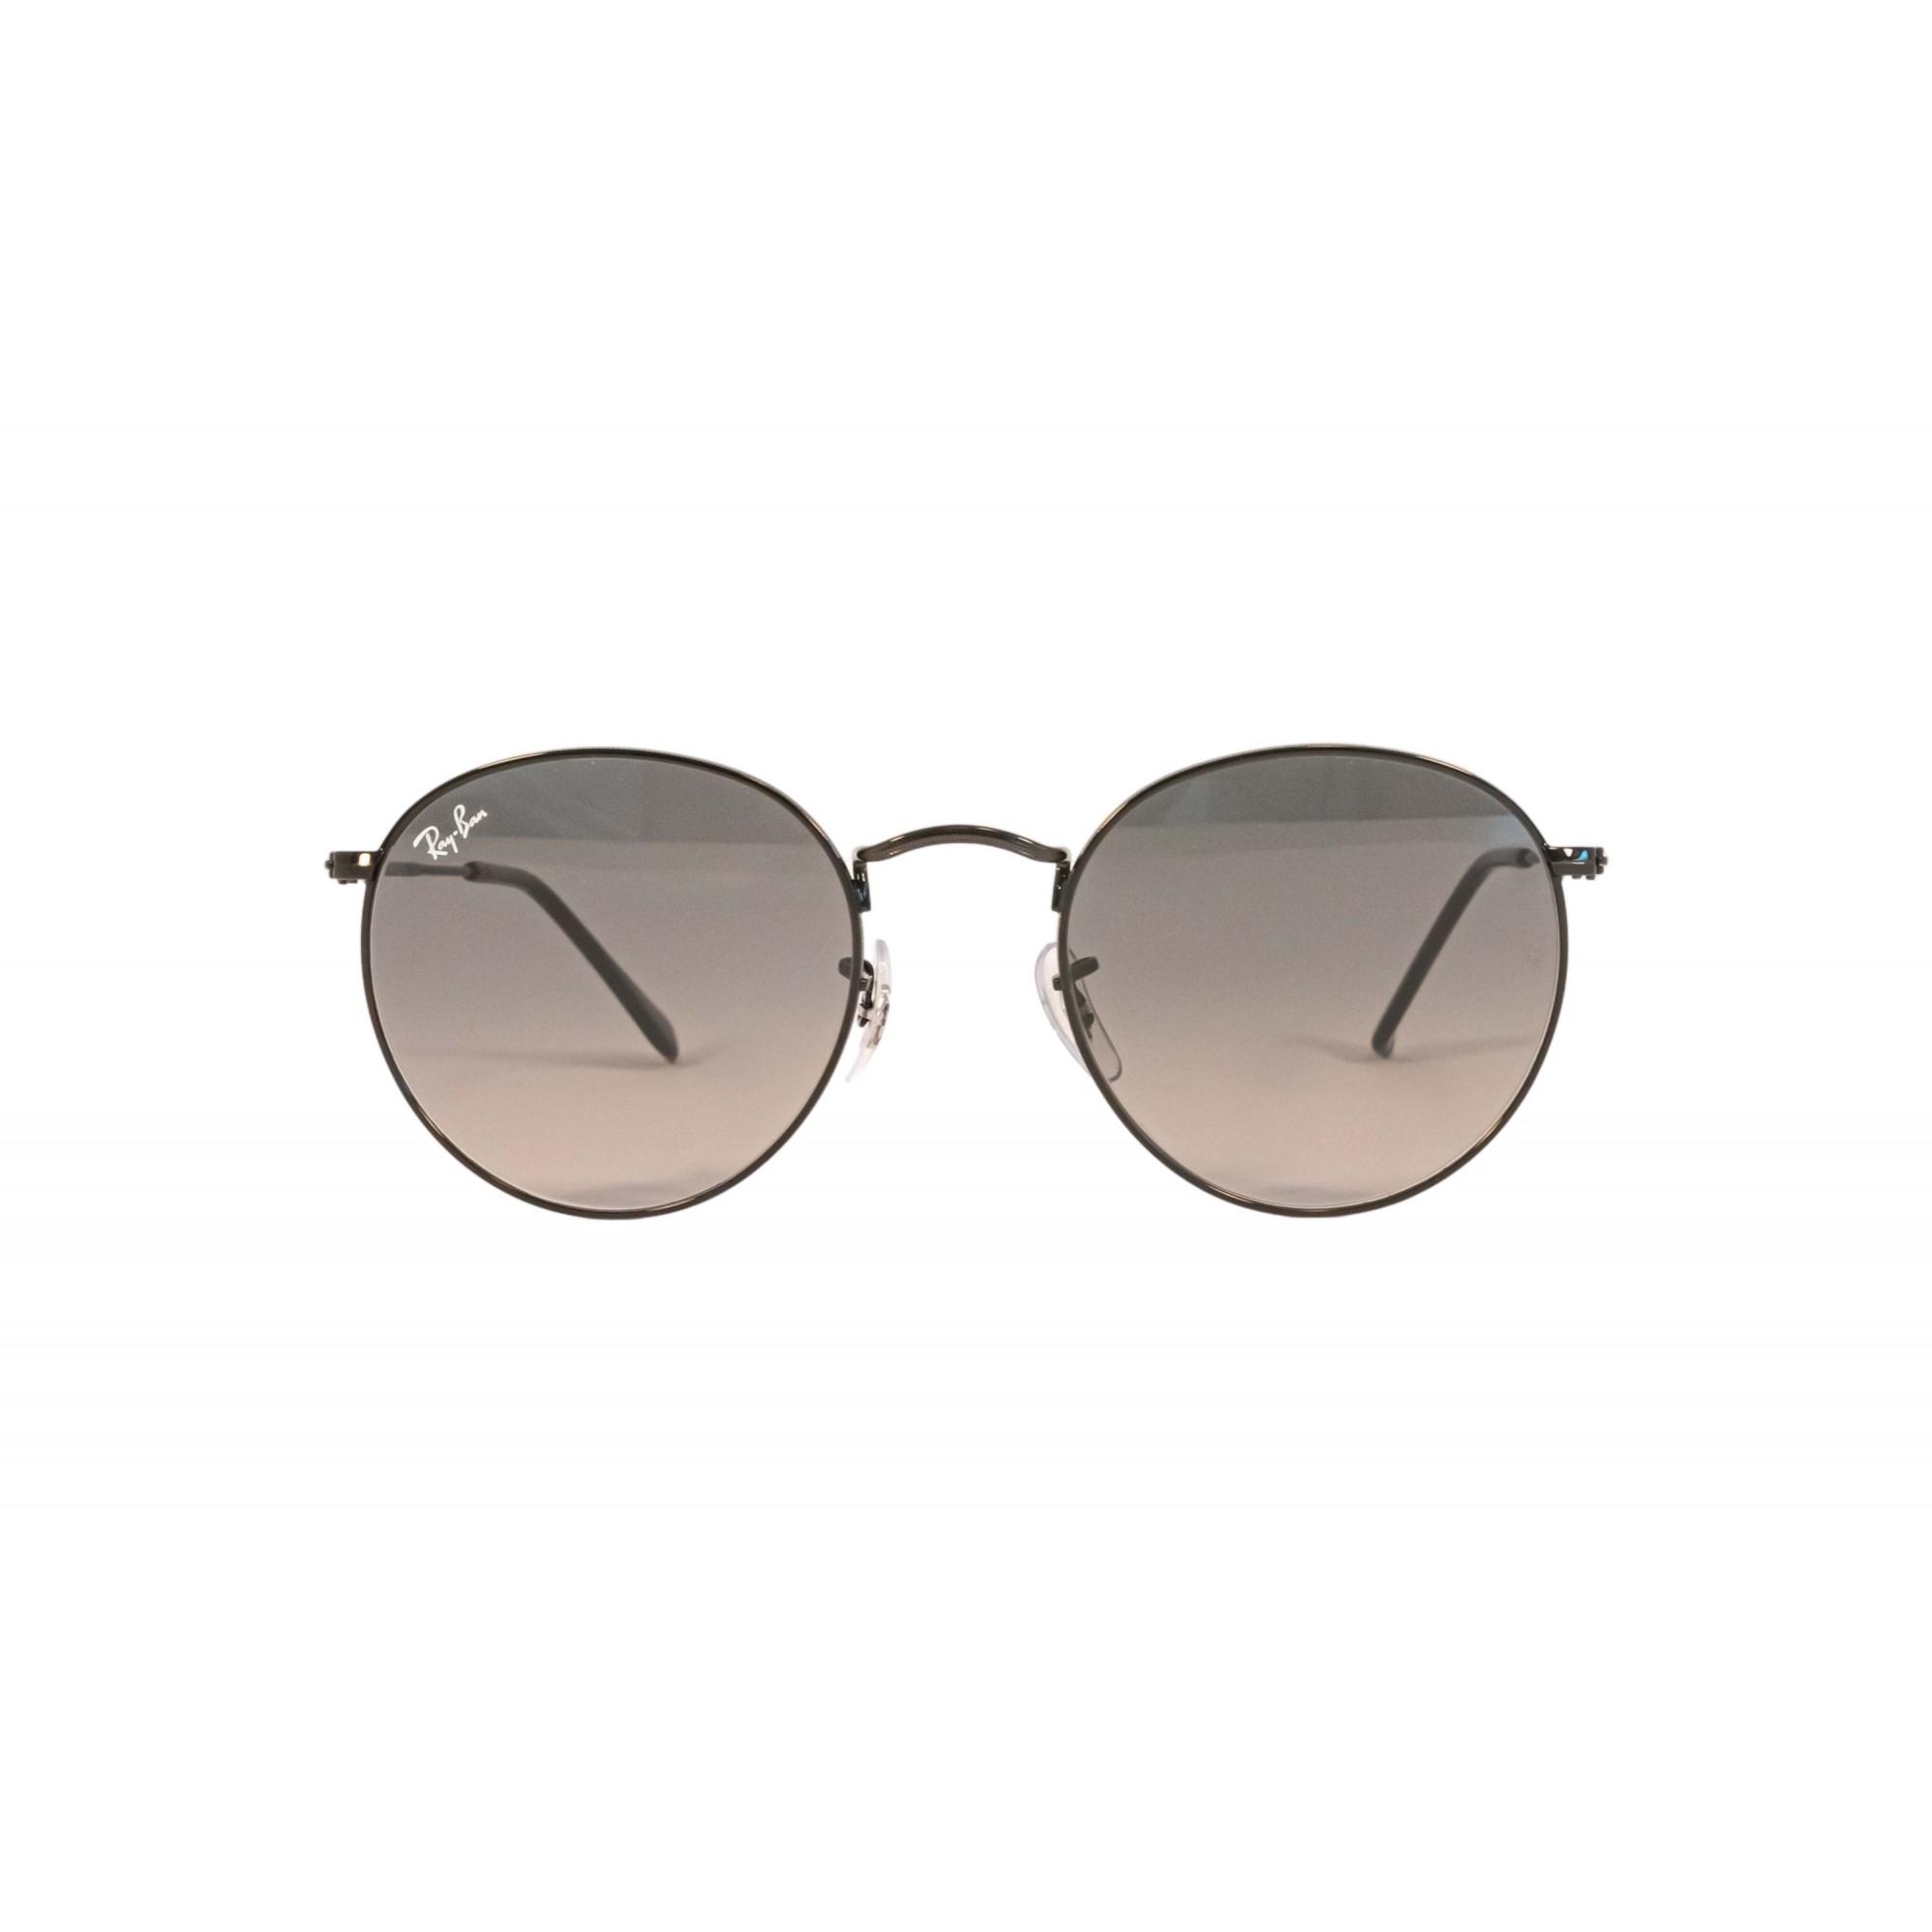 Óculos Ray Ban Round Rb3447nl 00271 53 Preto